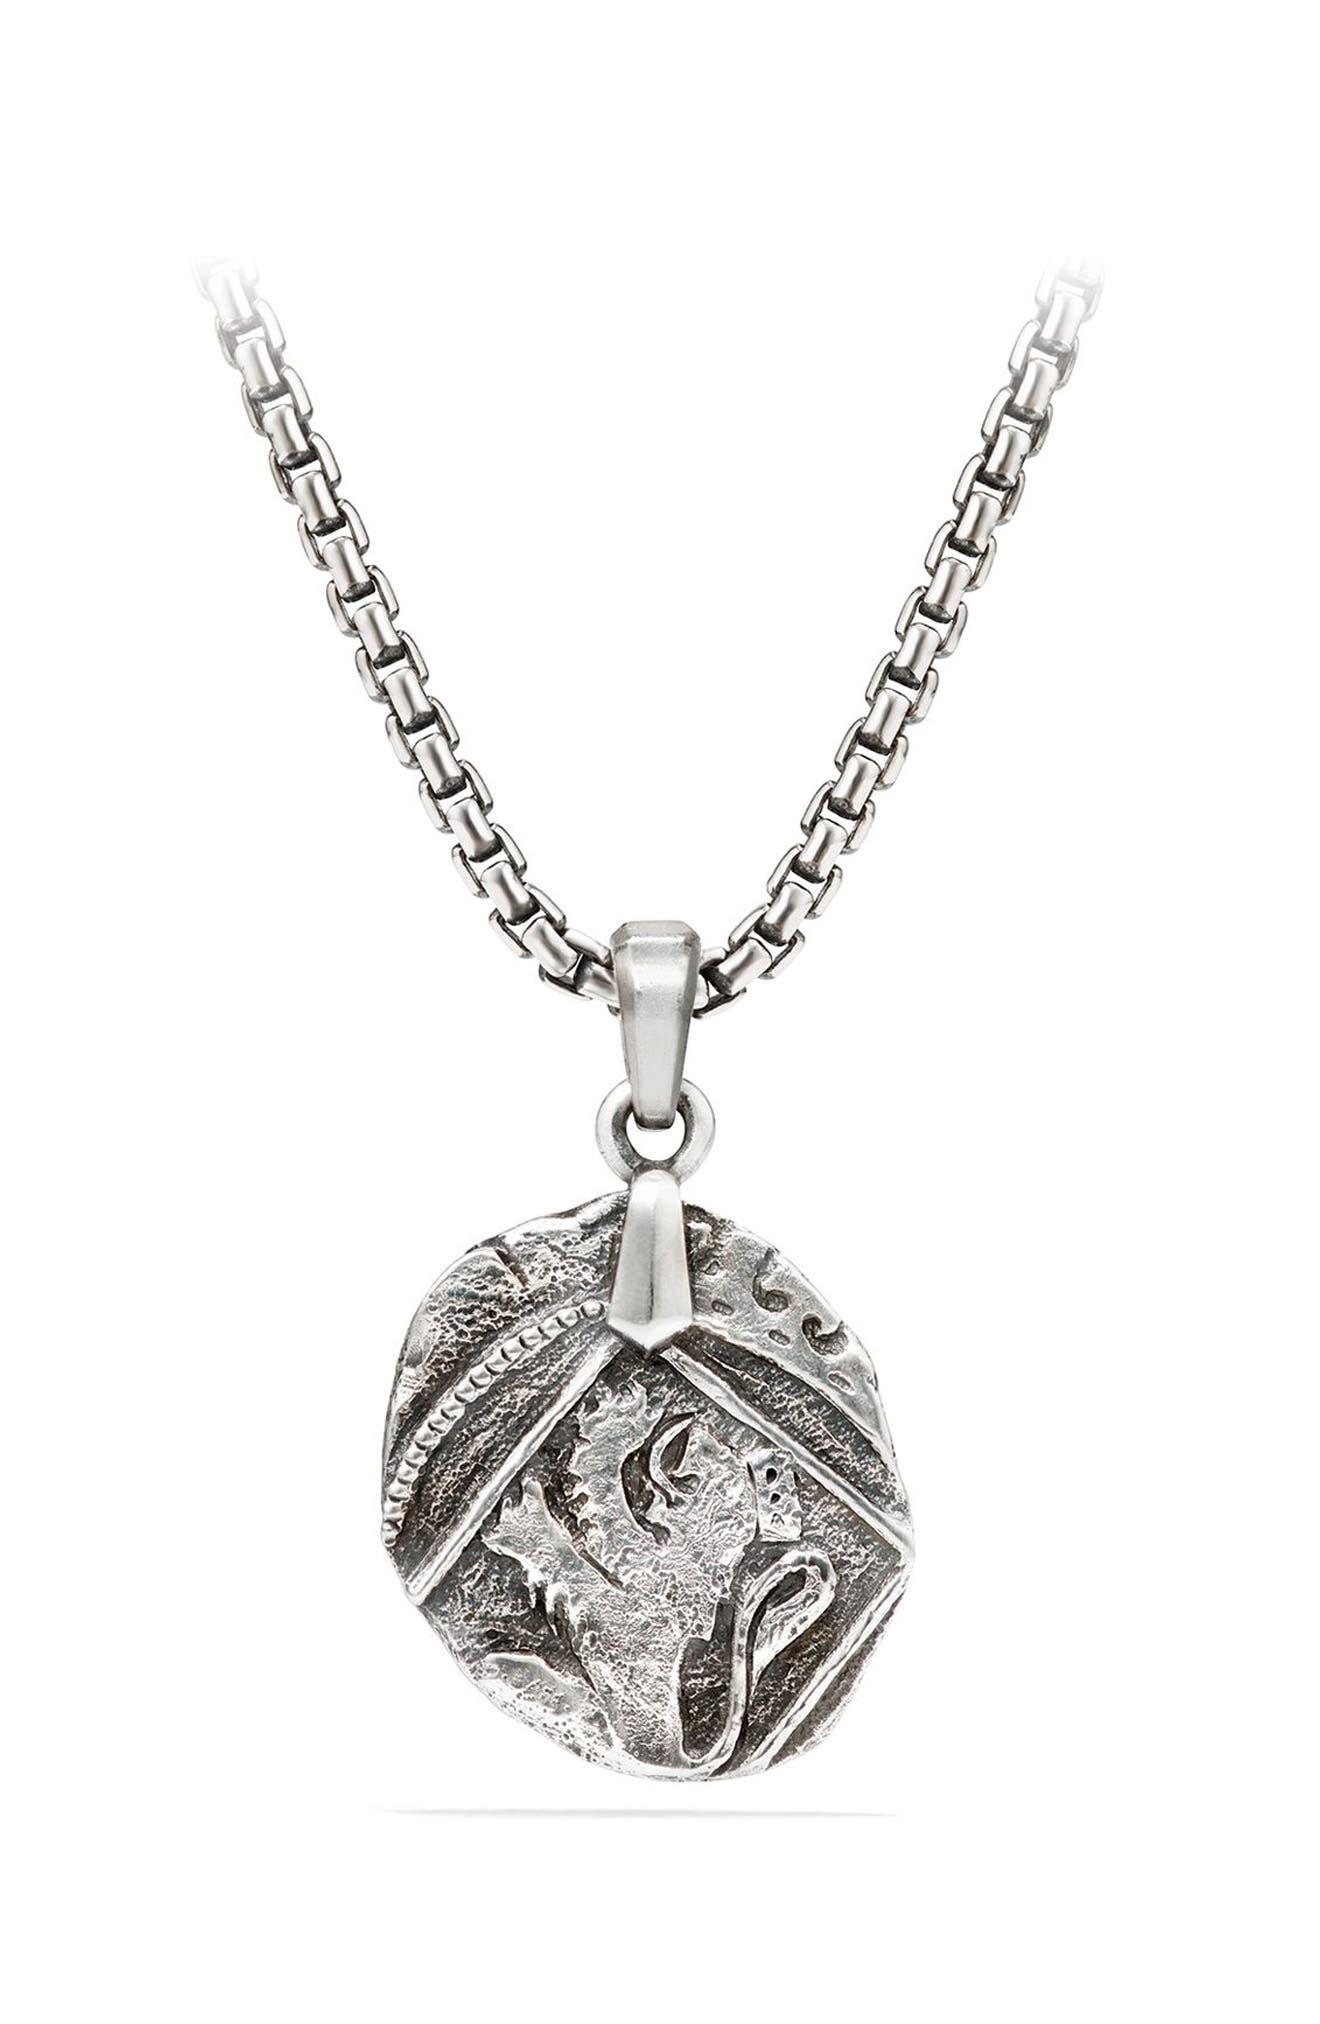 David Yurman Shipwreck Coin Amulet, 23mm